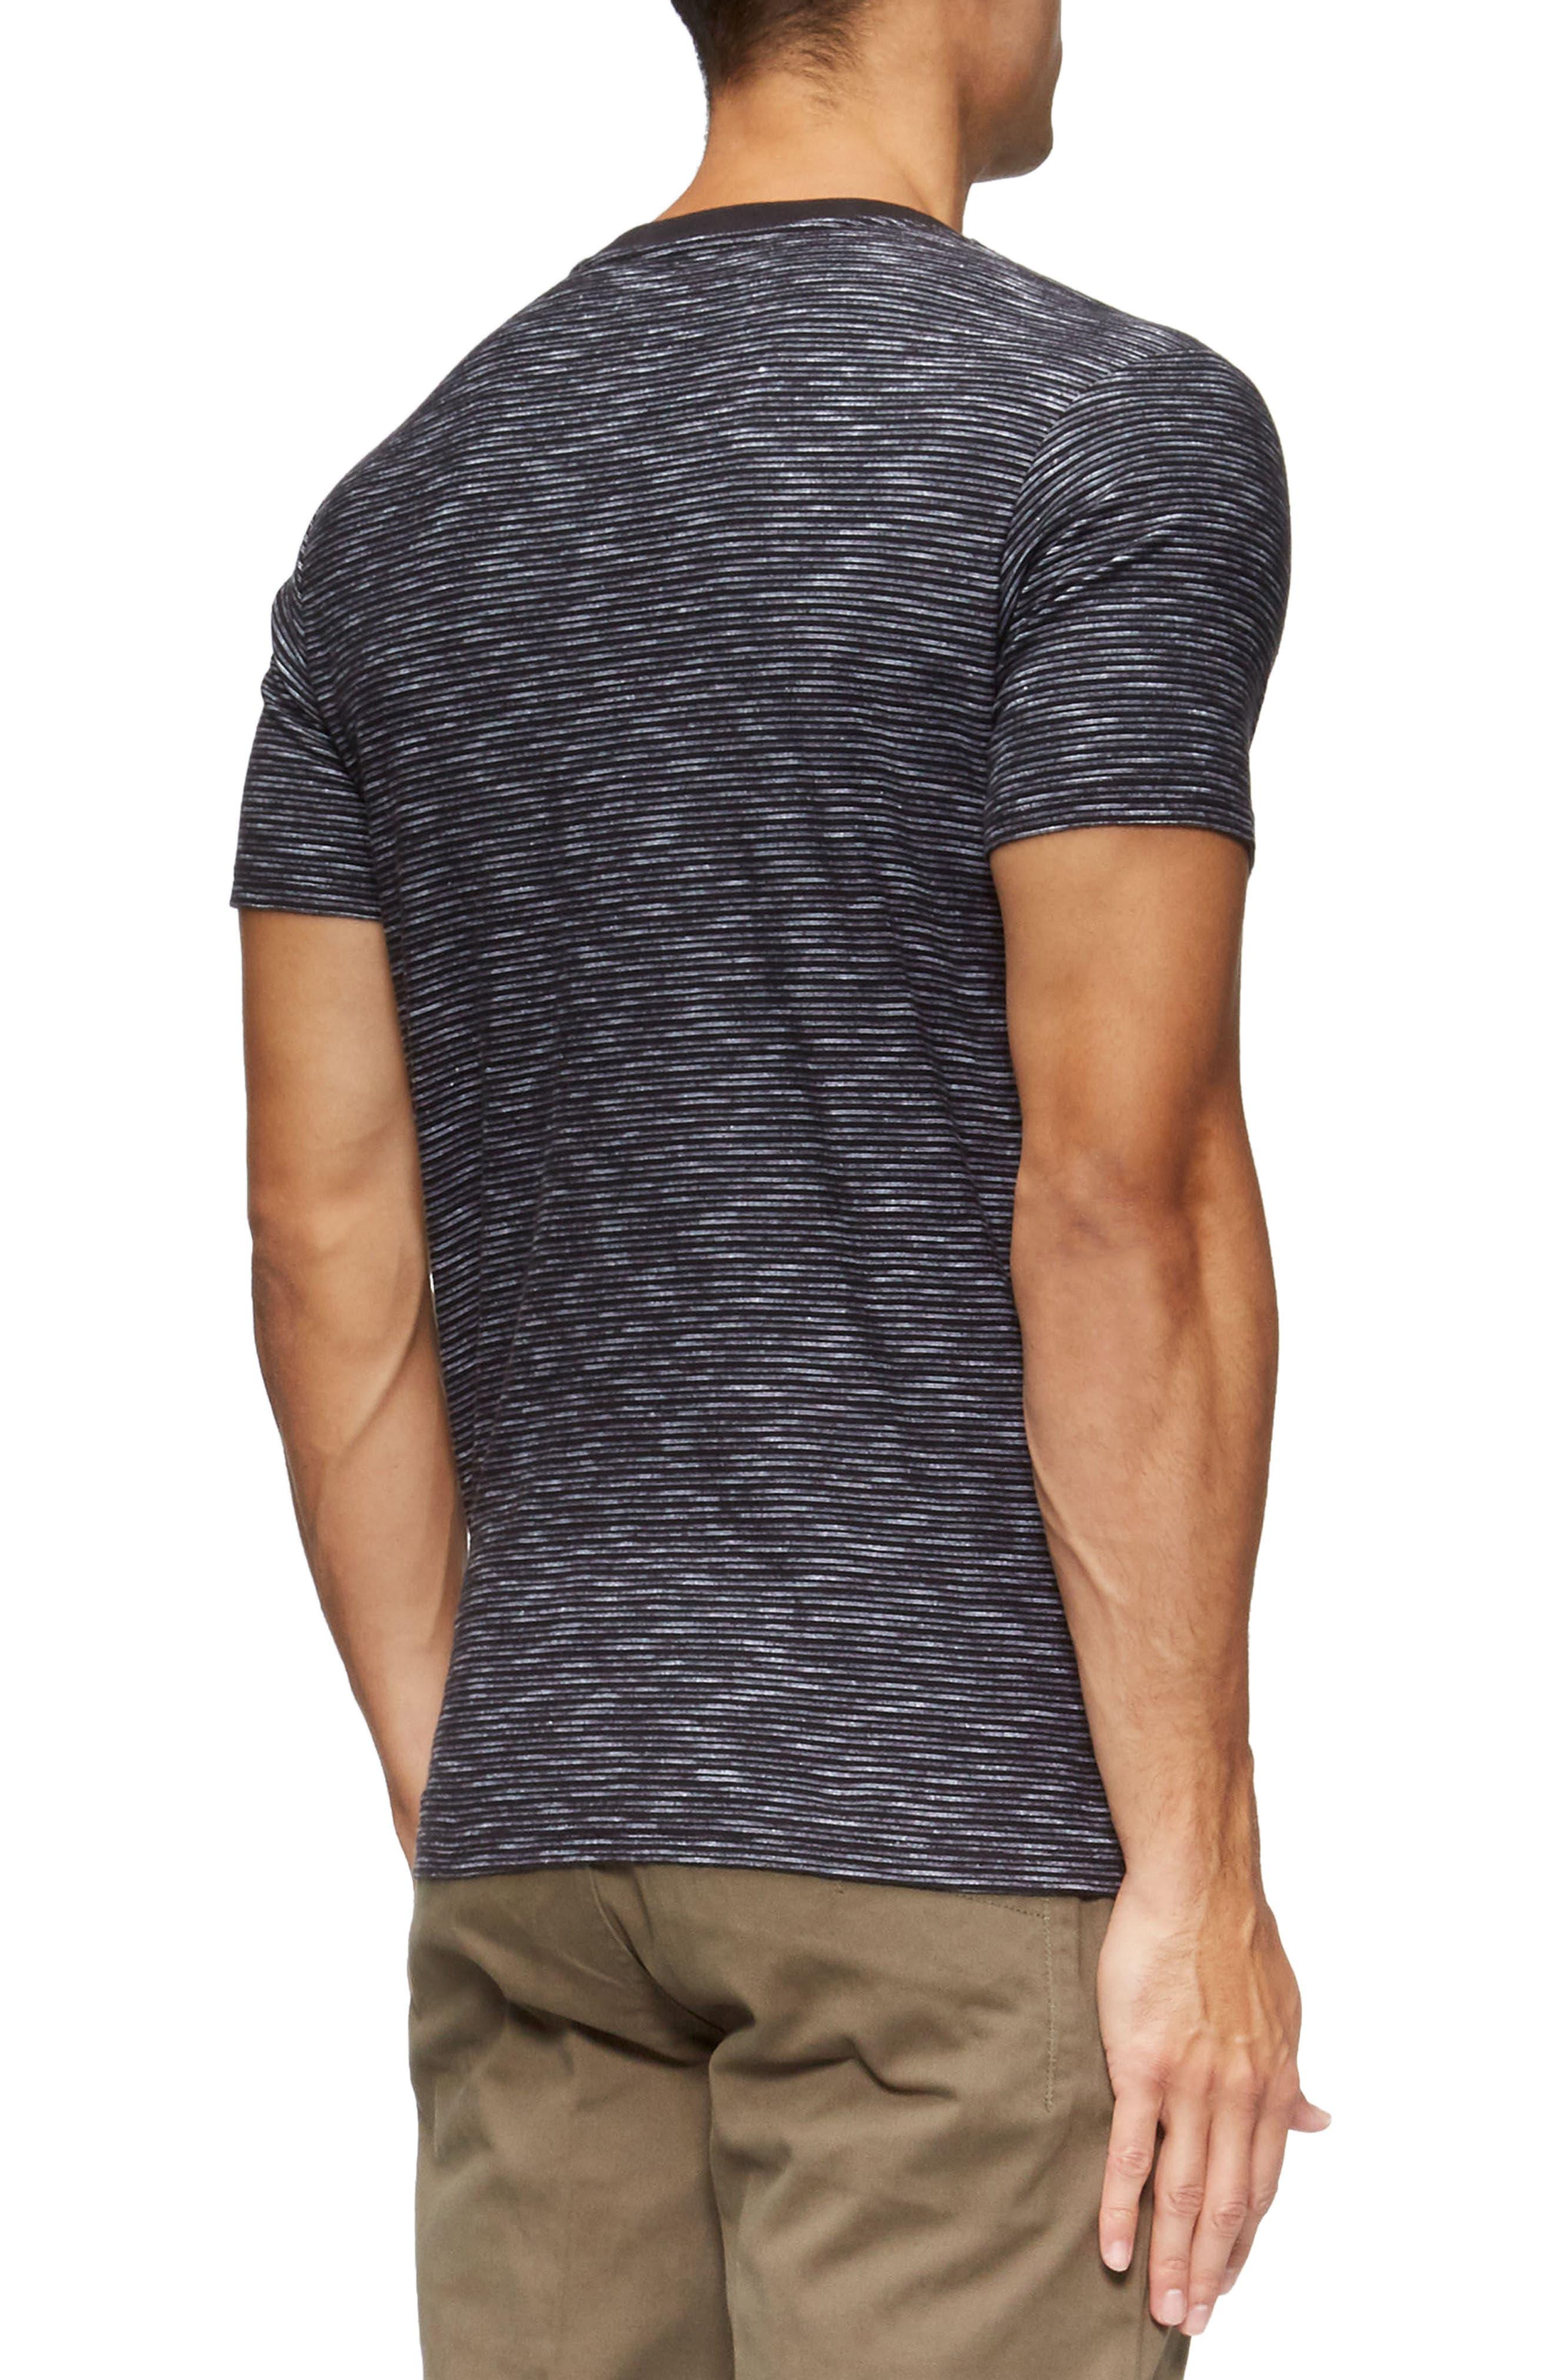 Redondo Stripe Pocket T-Shirt,                             Alternate thumbnail 2, color,                             Black/ White Stripe